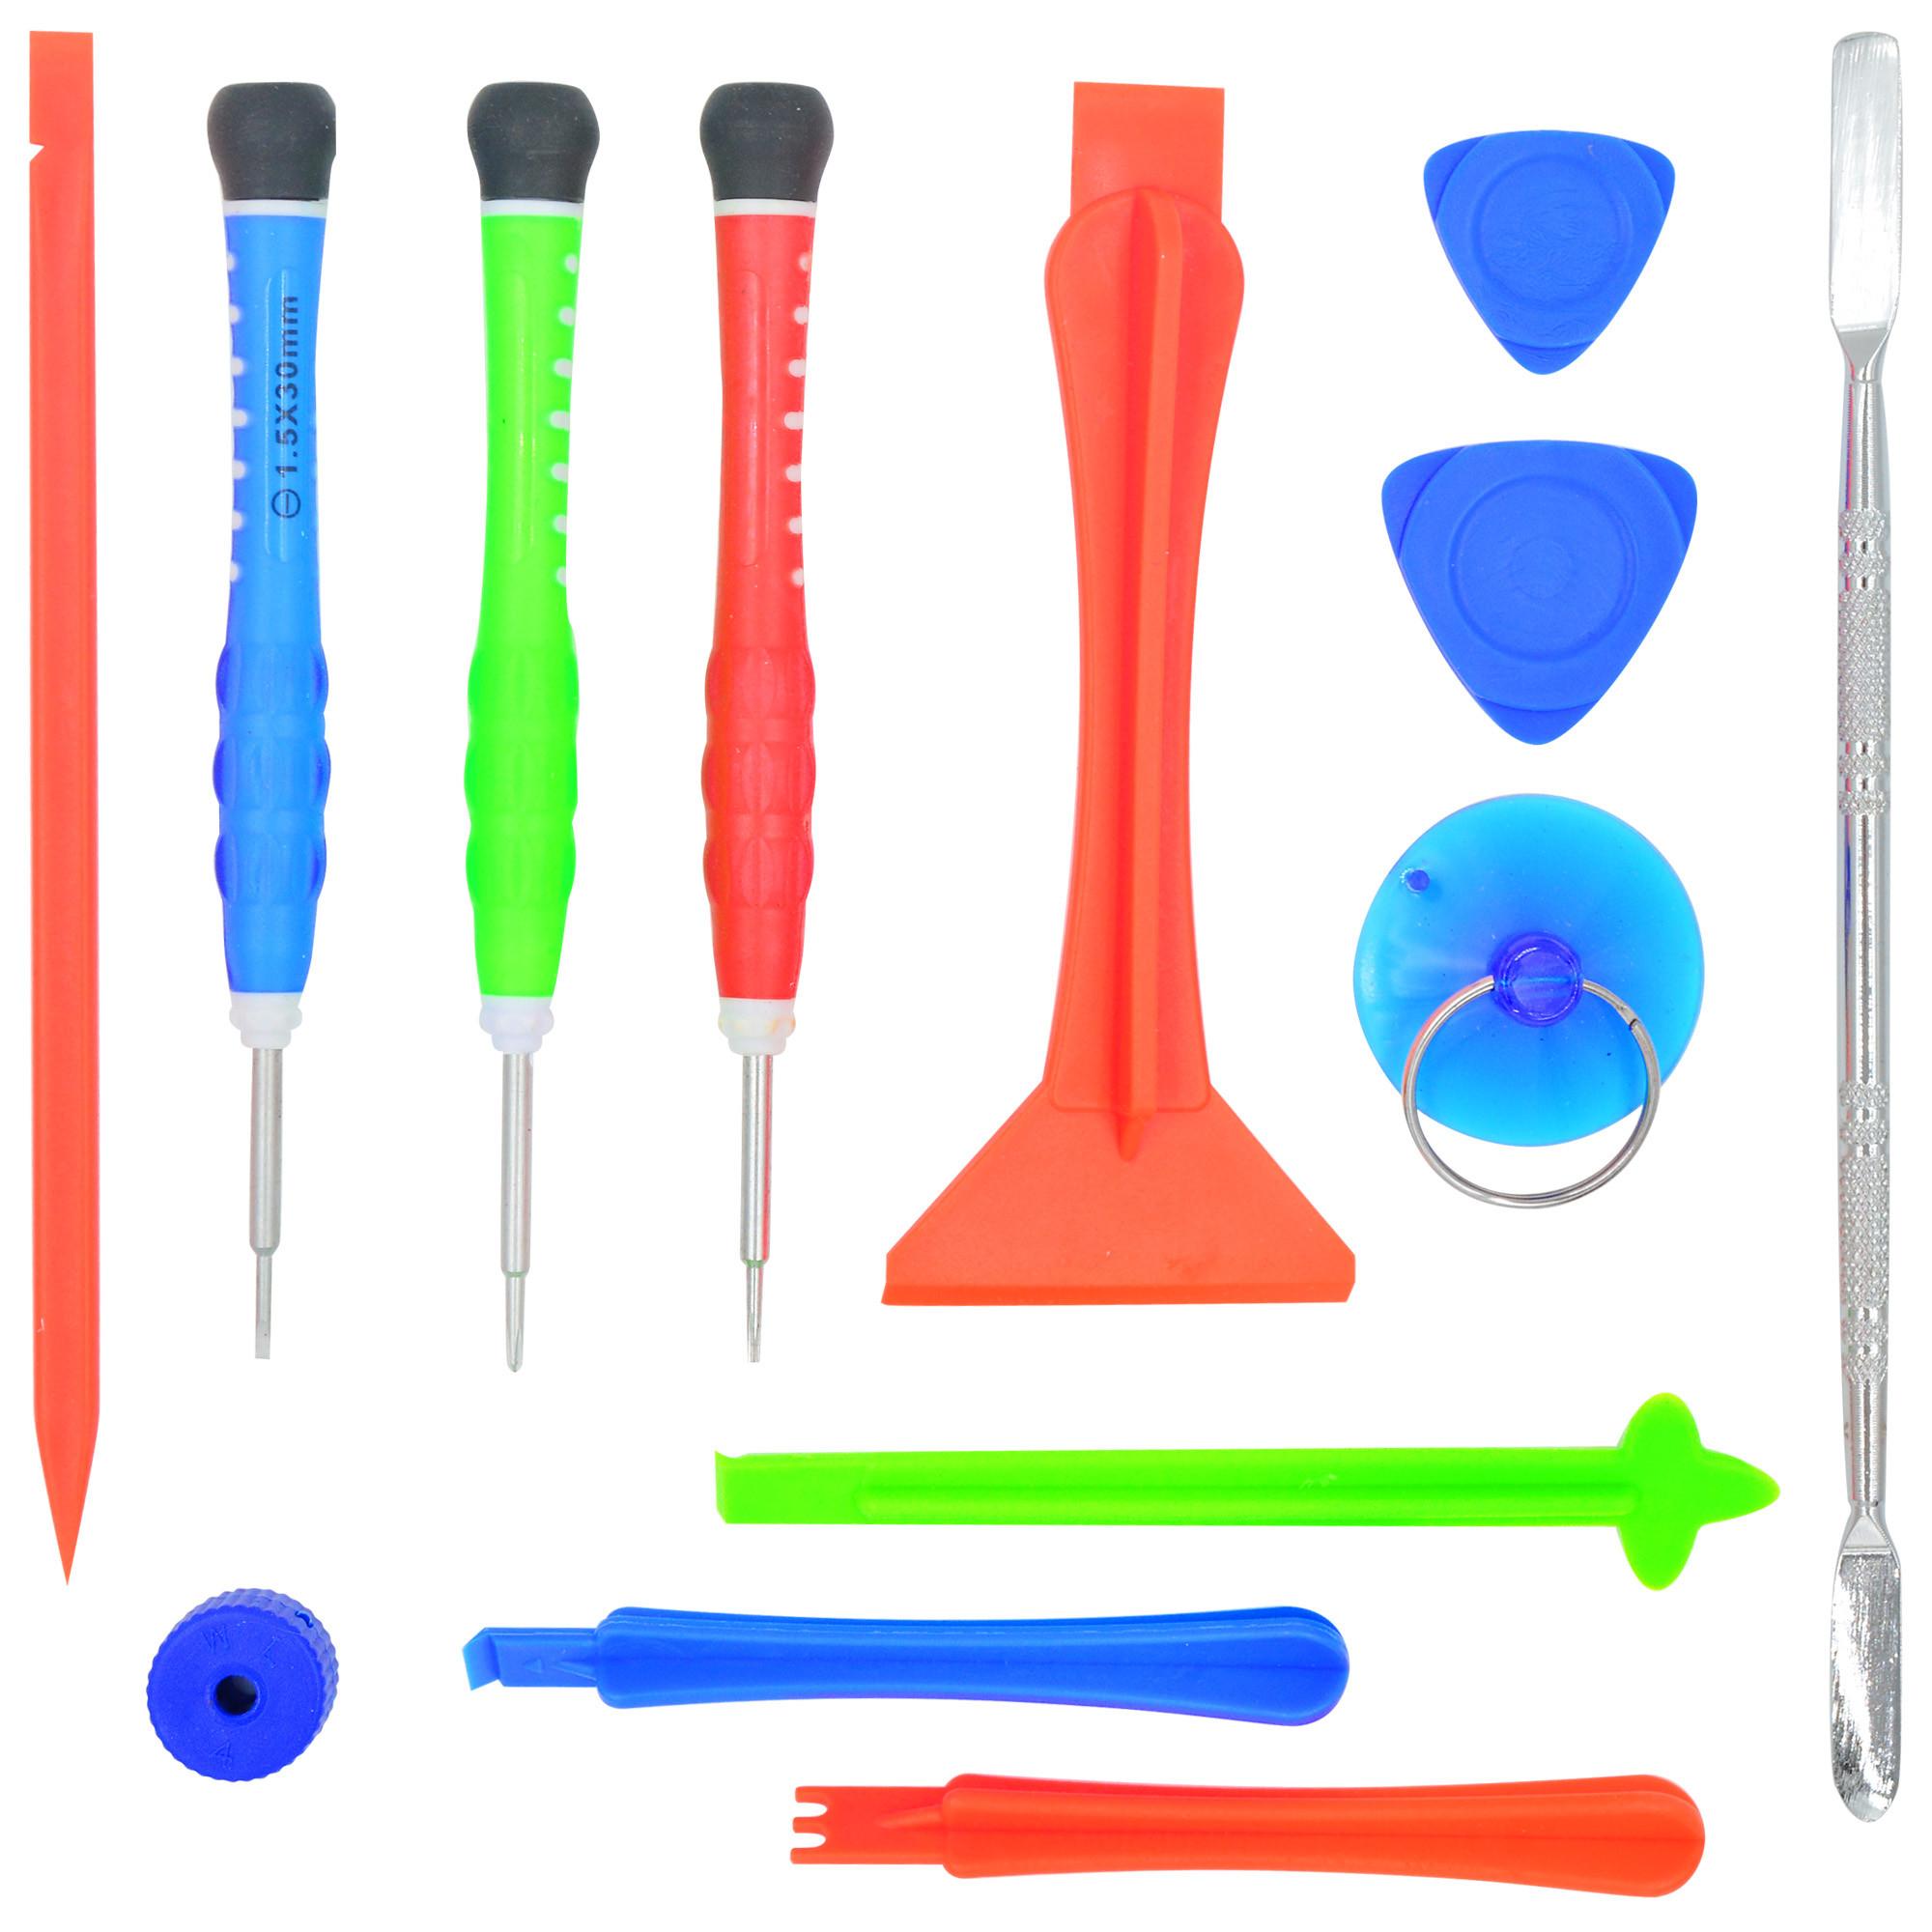 MENGS® 13 In 1 Cell Phone Repair Tool Kits For Iphone ,Blackberry, Motorola, Nokia, HTC Series Mobile Phone